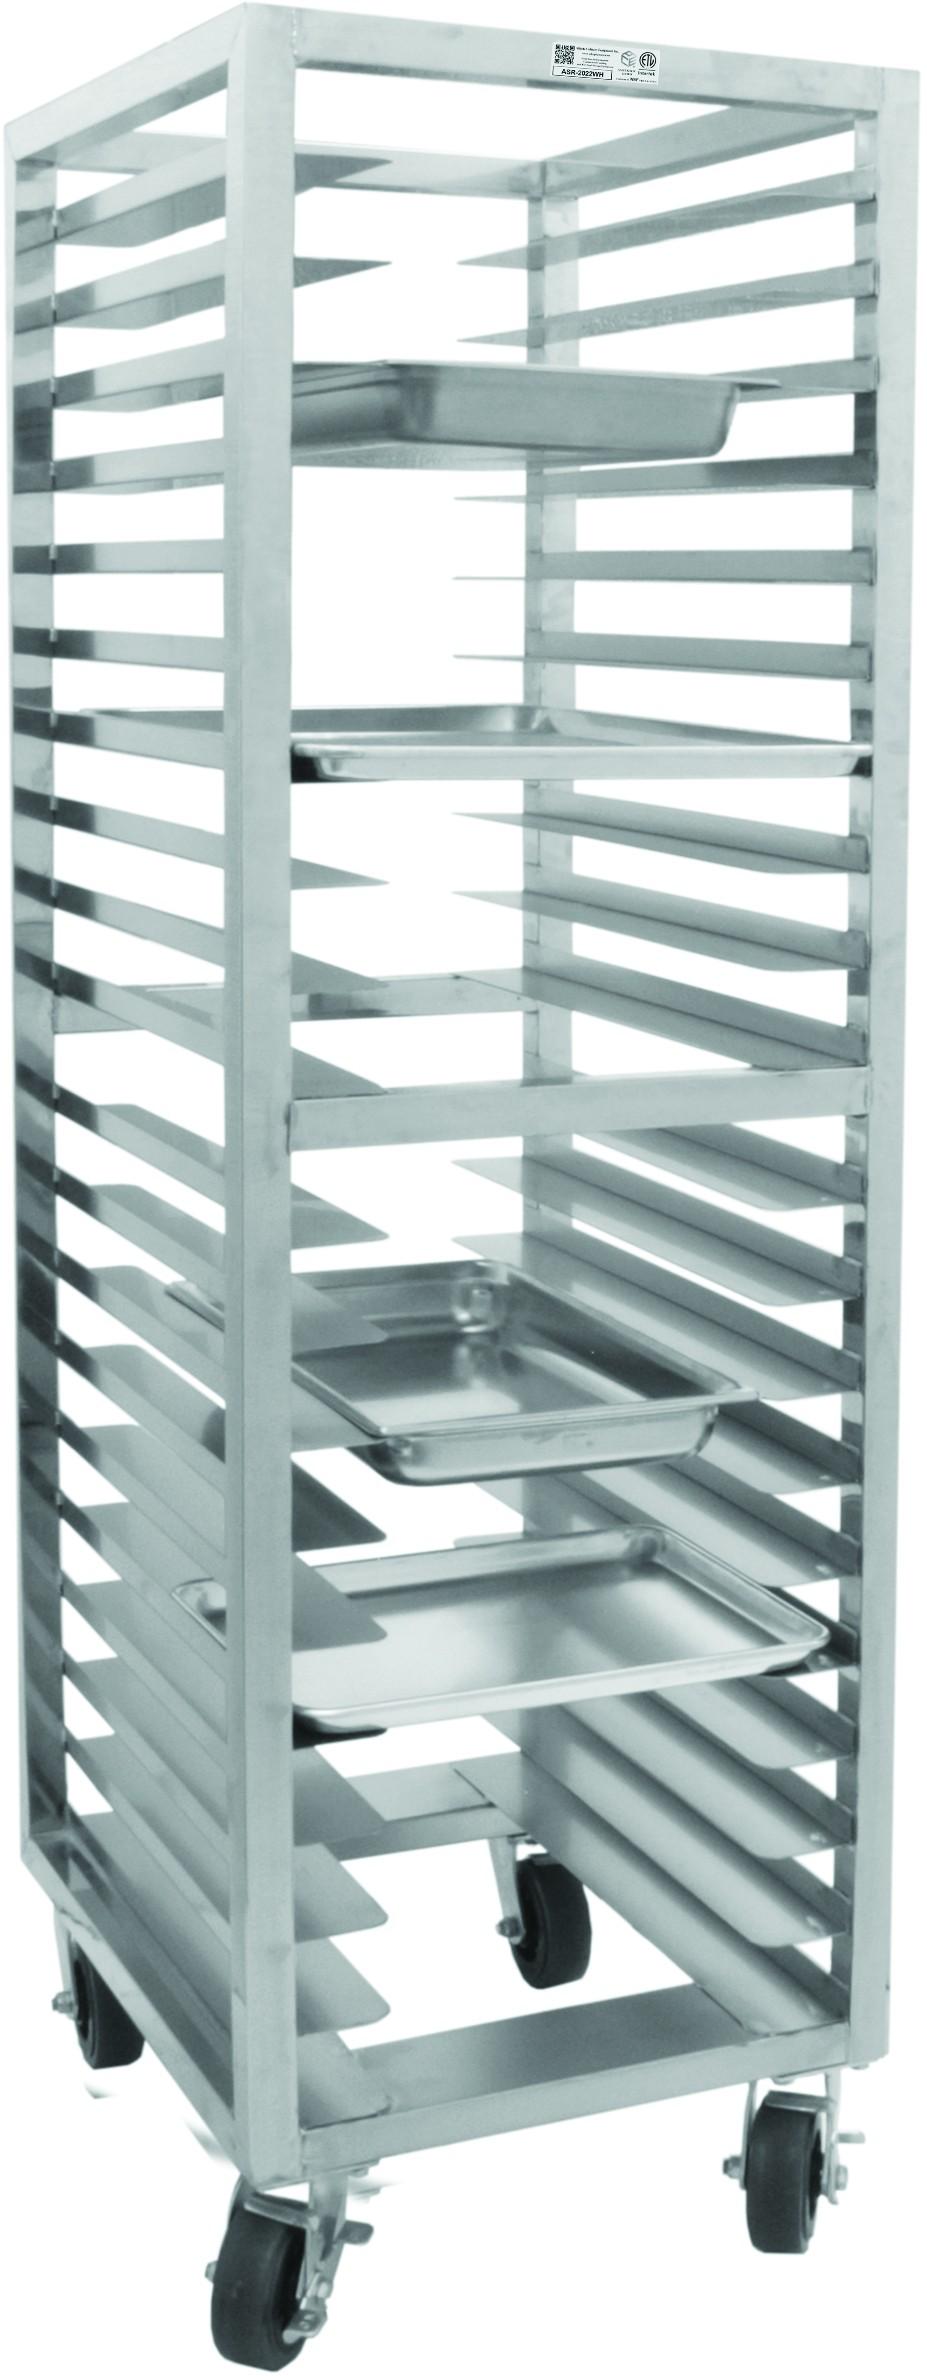 All Welded Stainless Steel Universal Bun Pan Rack - GSW